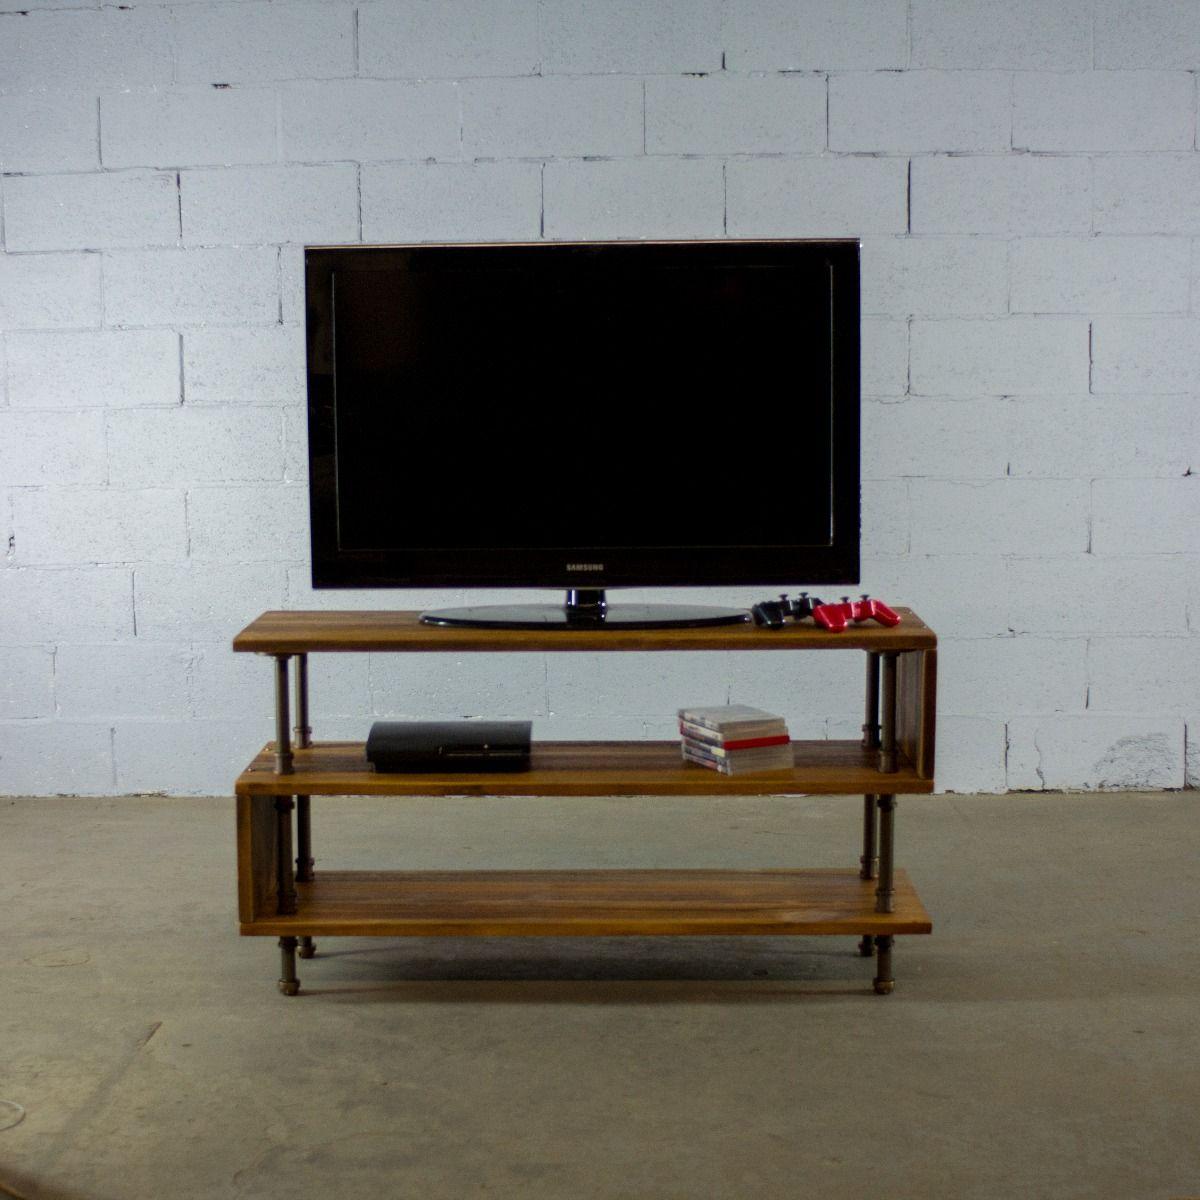 Modern TV Stand Entertainment Center Console Media Home Theater Furniture Shelf